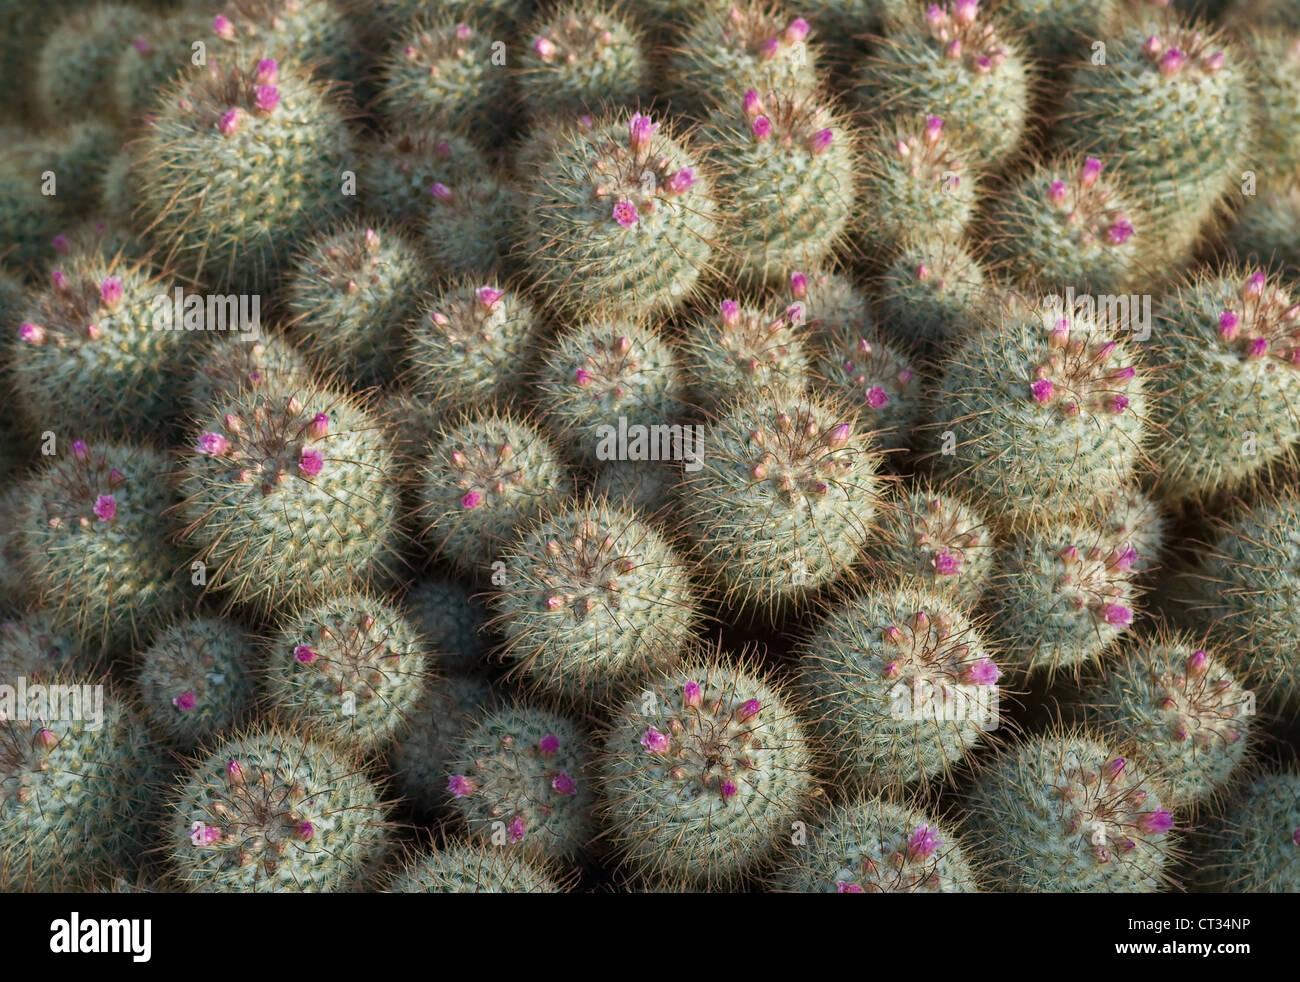 Mammillaria bombycina, Cactus, Pincushion cactus Stock Photo